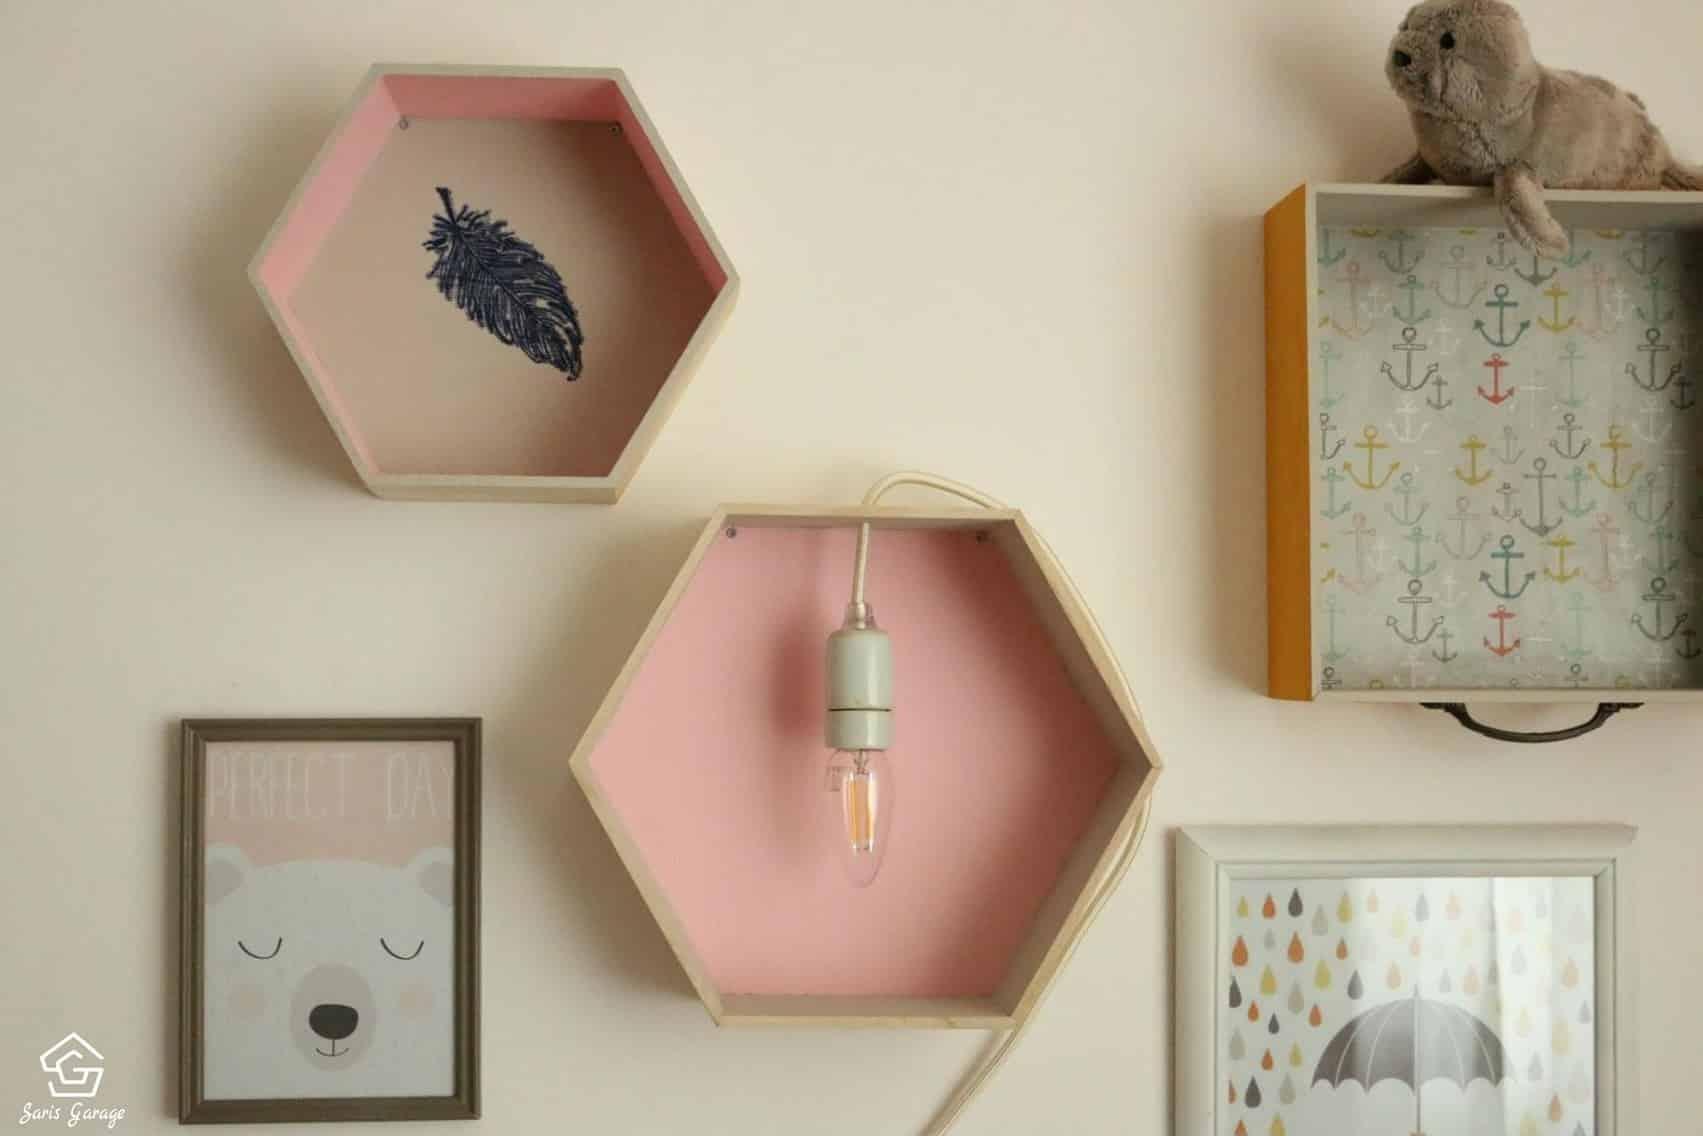 ᐅ Lampe Für Kinder Selber Bauen